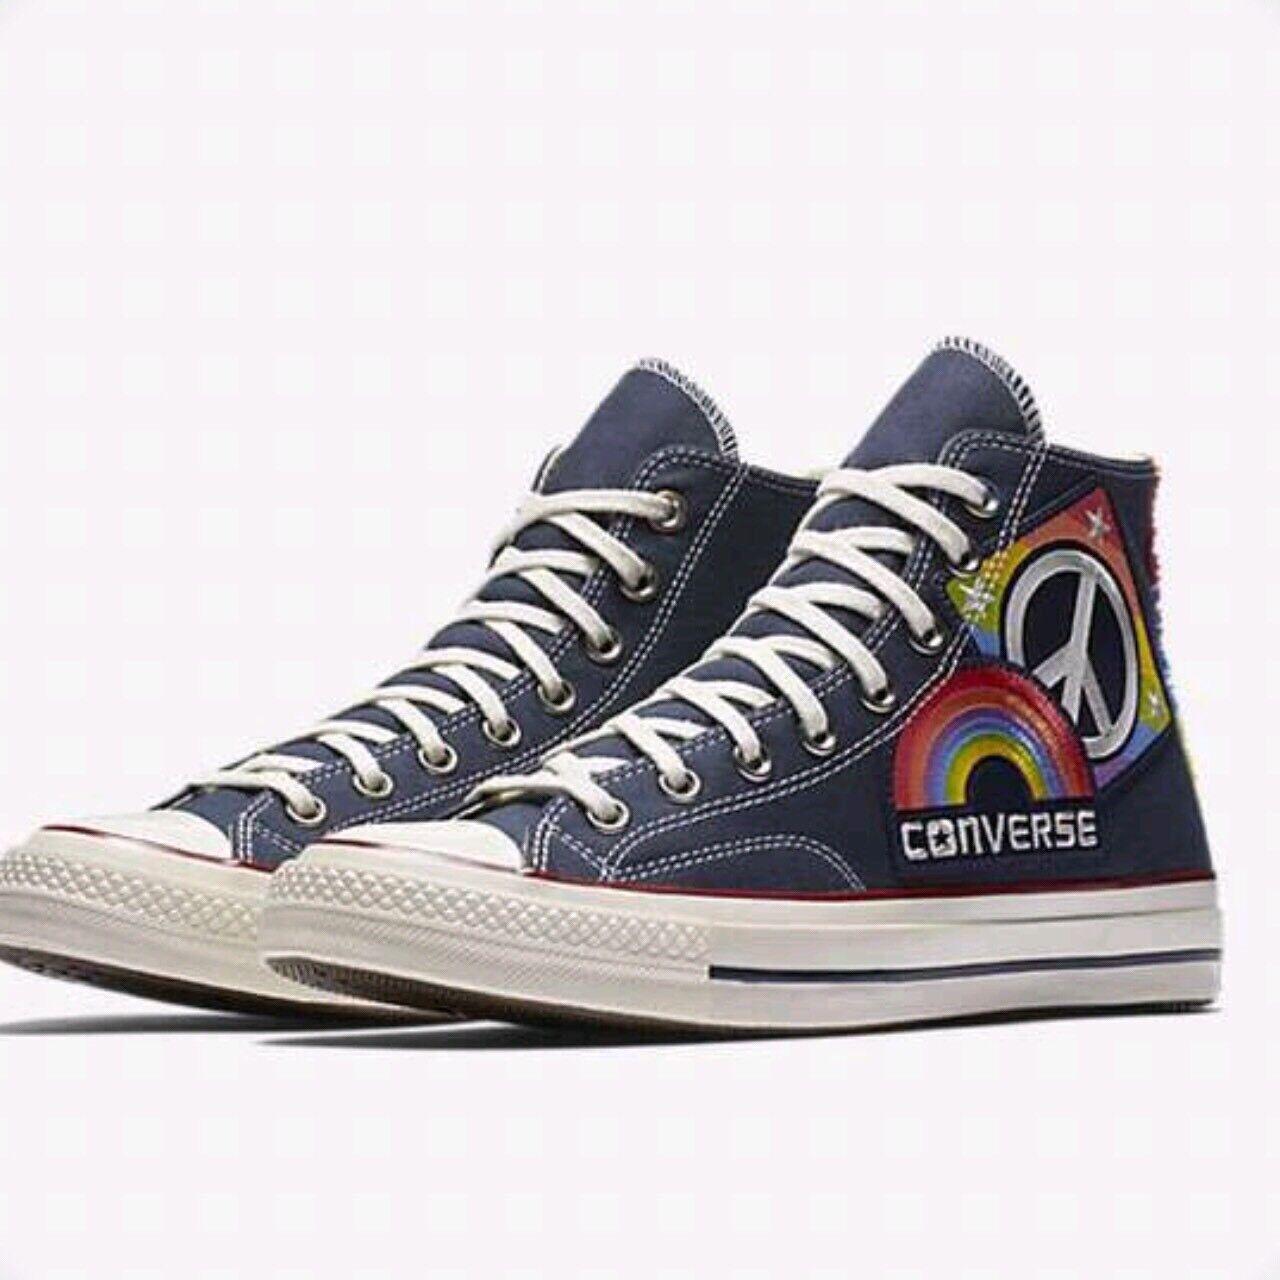 Converse Chuck Taylor All Star HI Pride Parade HighTop Blue/Rainbow Taglia 9